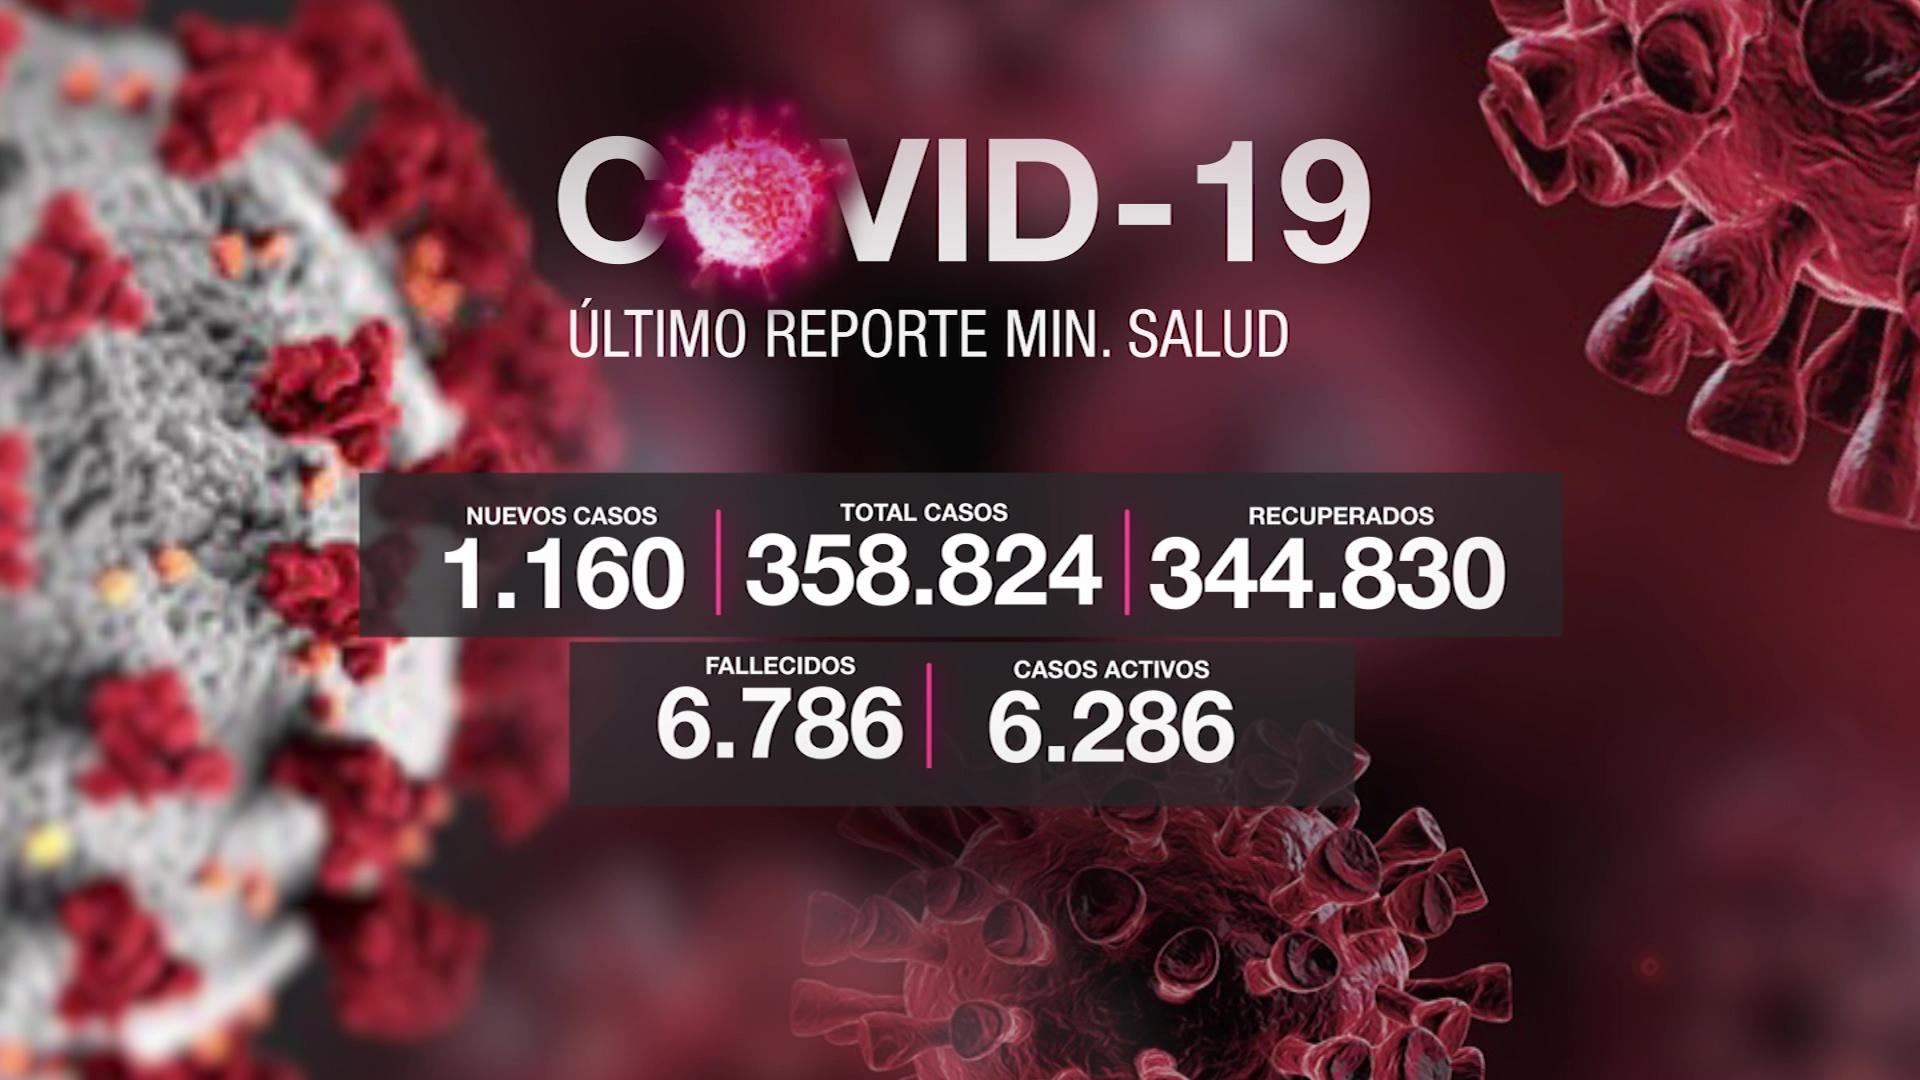 Panorama de la pandemia en Antioquia